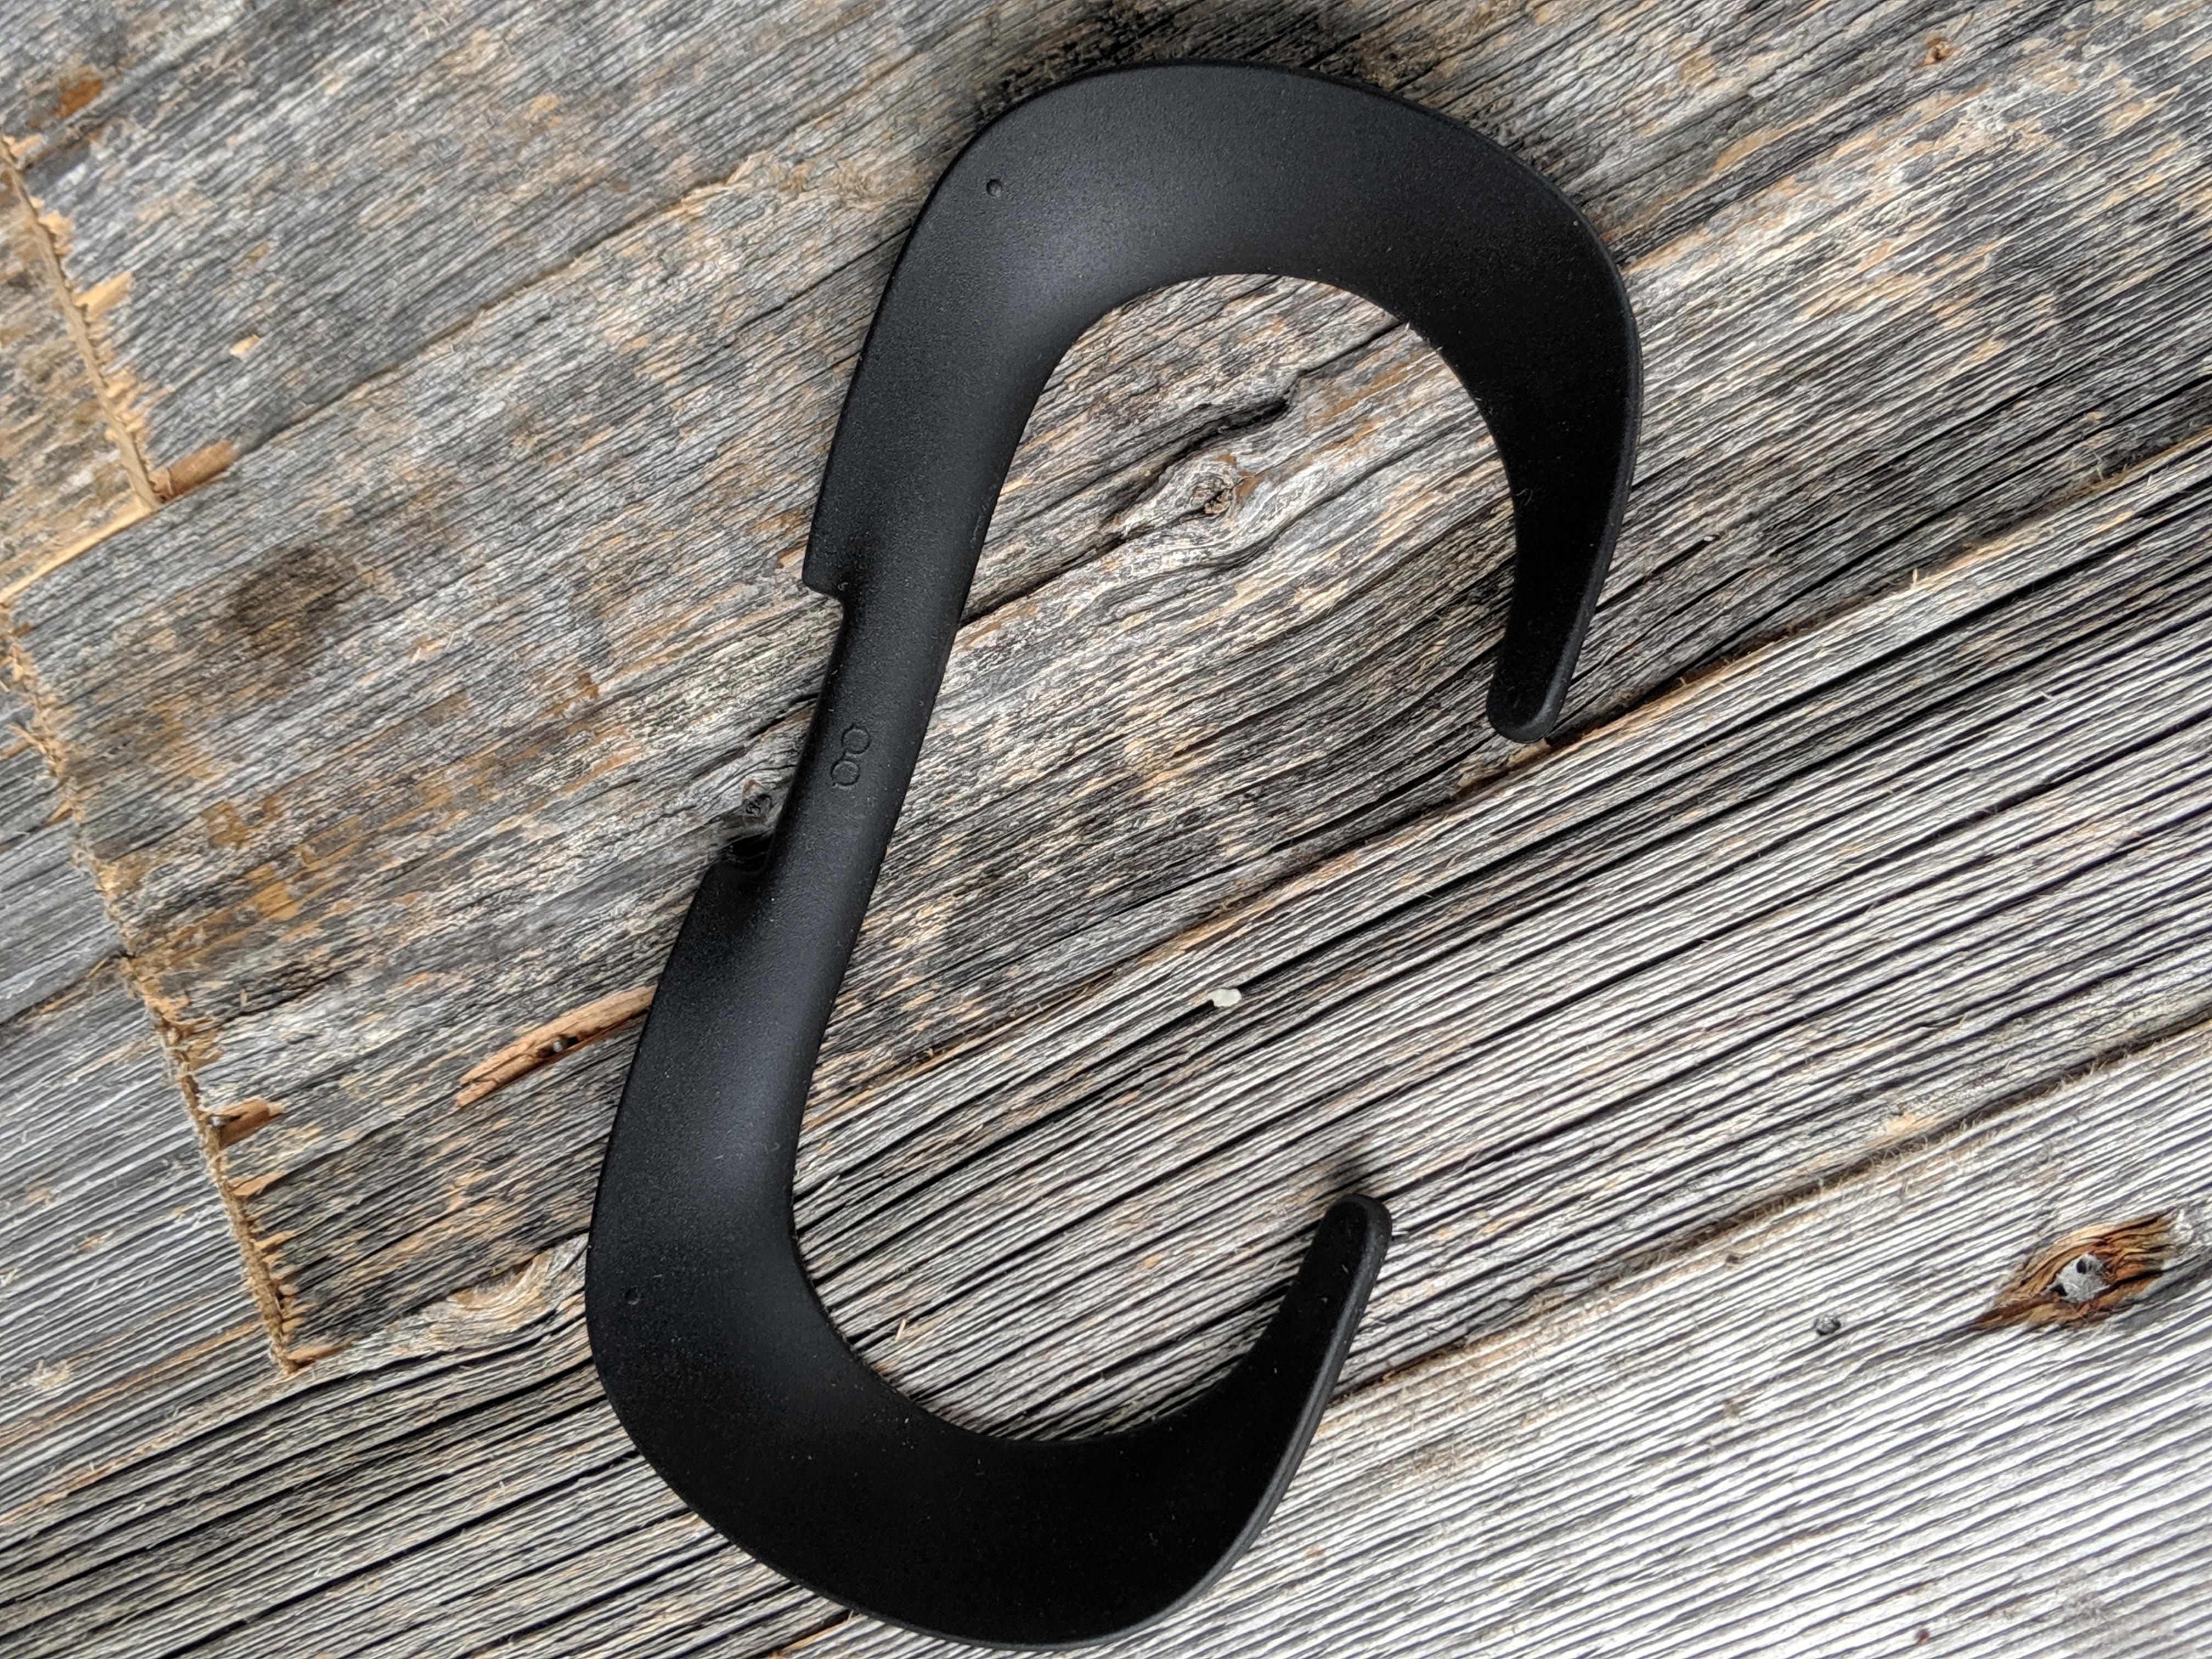 oculus Go eyeglass spacer